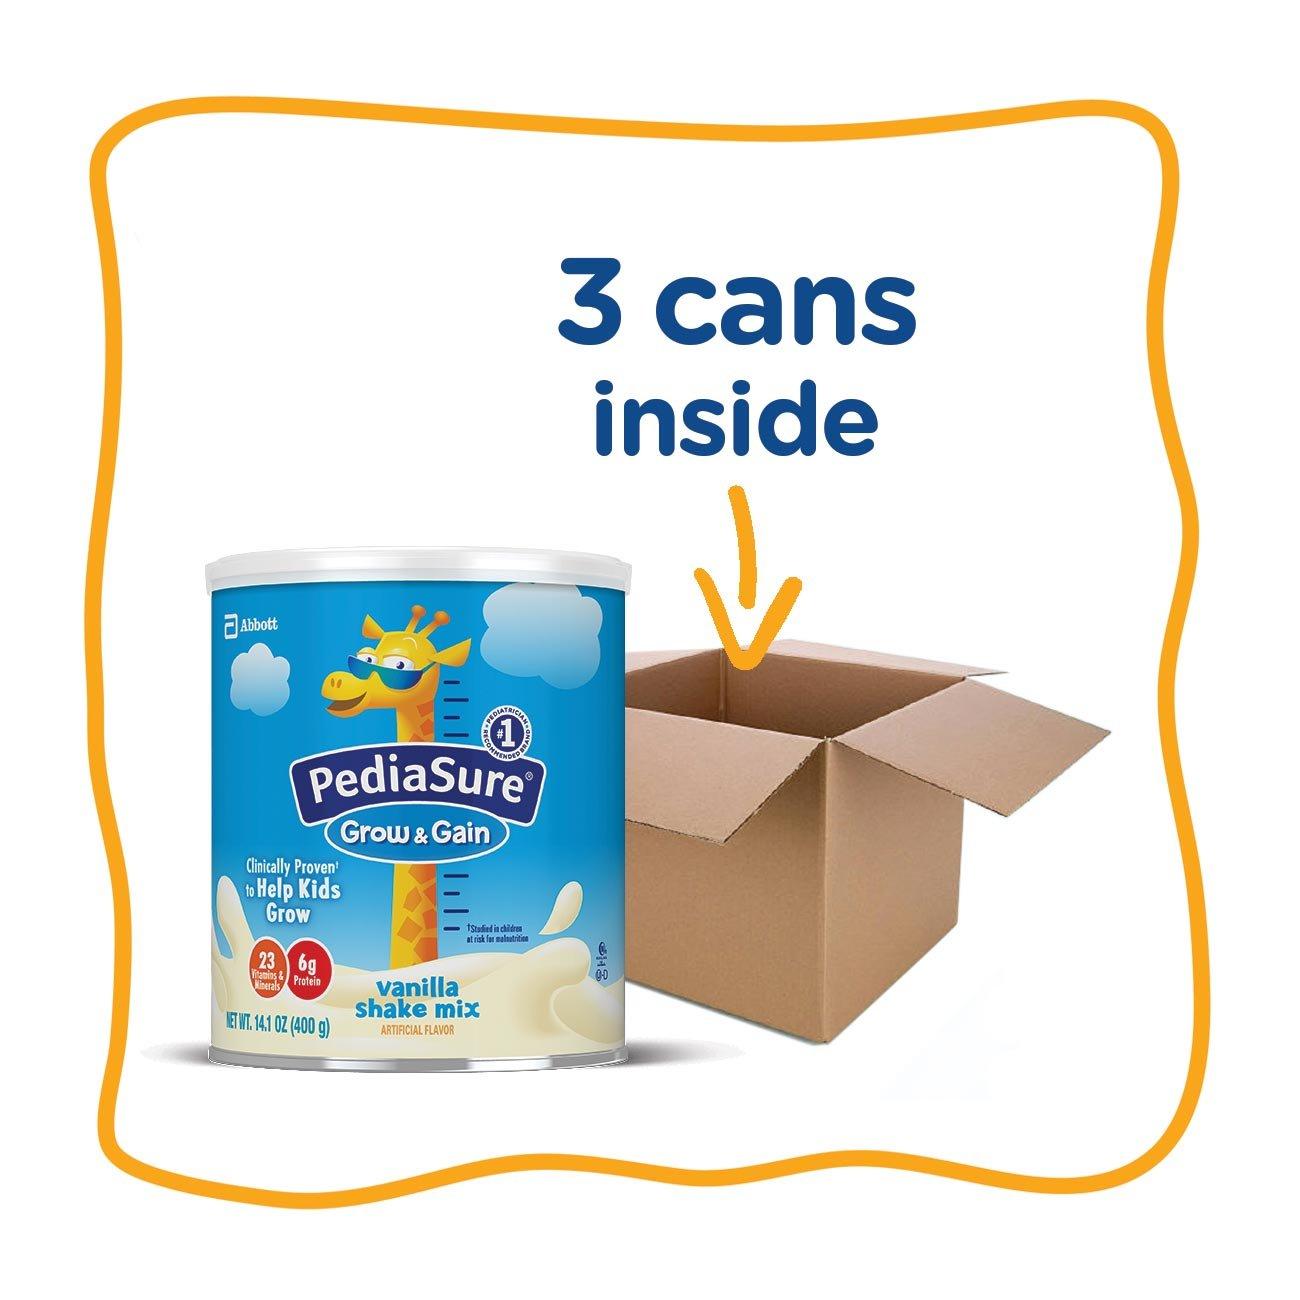 PediaSure Grow & Gain Non-GMO Vanilla Shake Mix Powder, Nutrition Shake for Kids, 14.1 oz, 3 Count by Pediasure (Image #12)